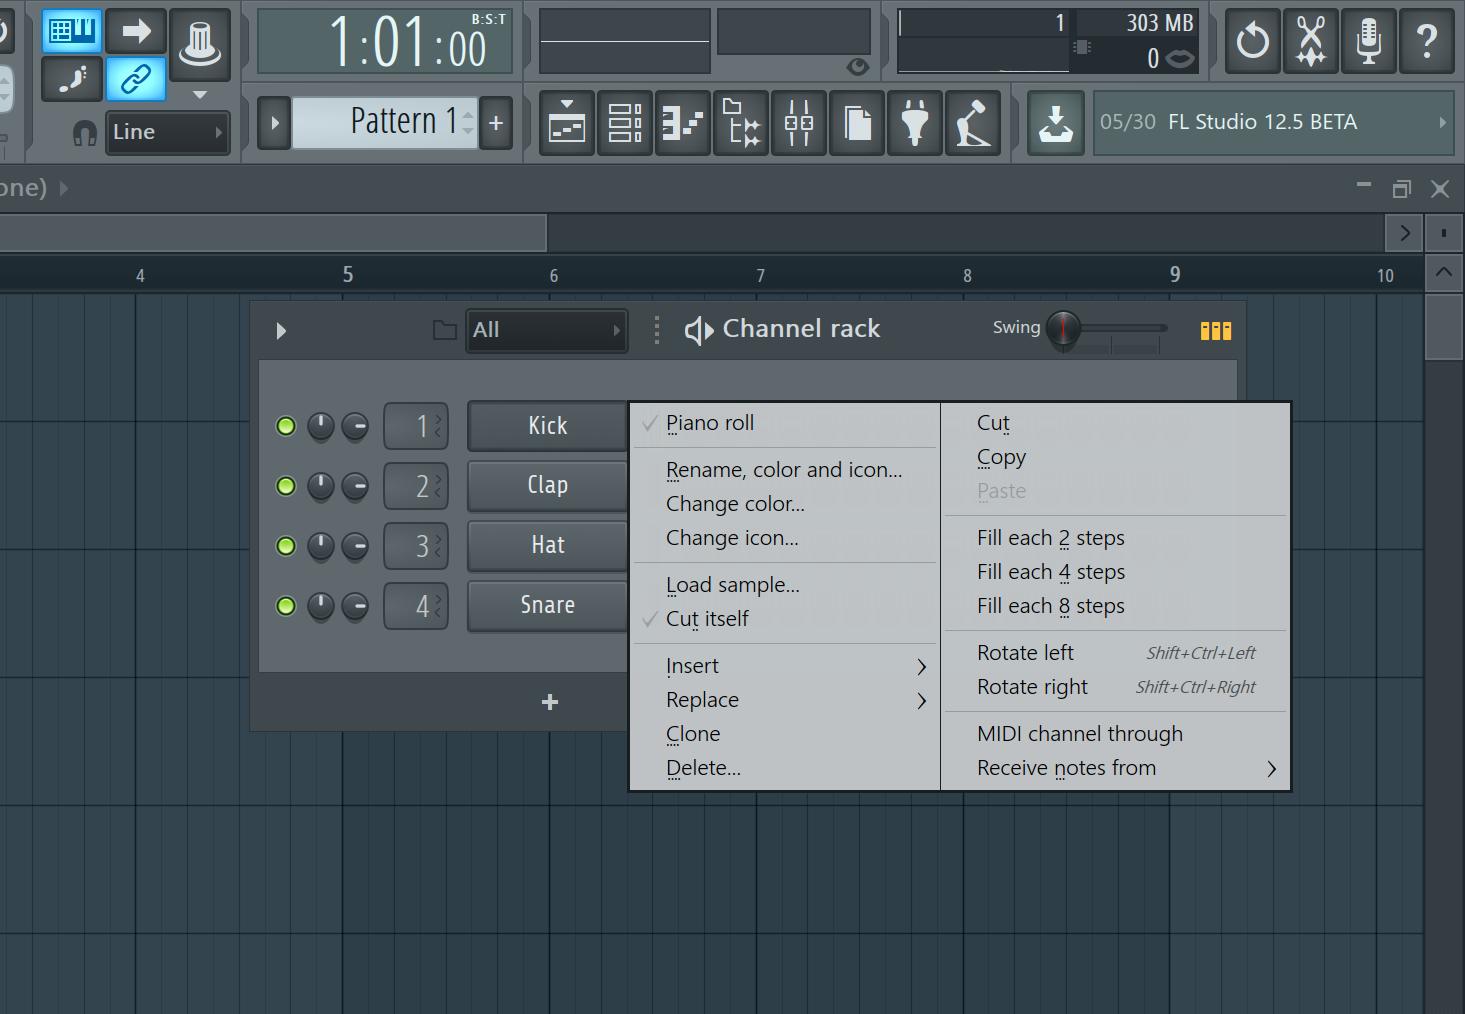 torrent how to crack fl studio 12